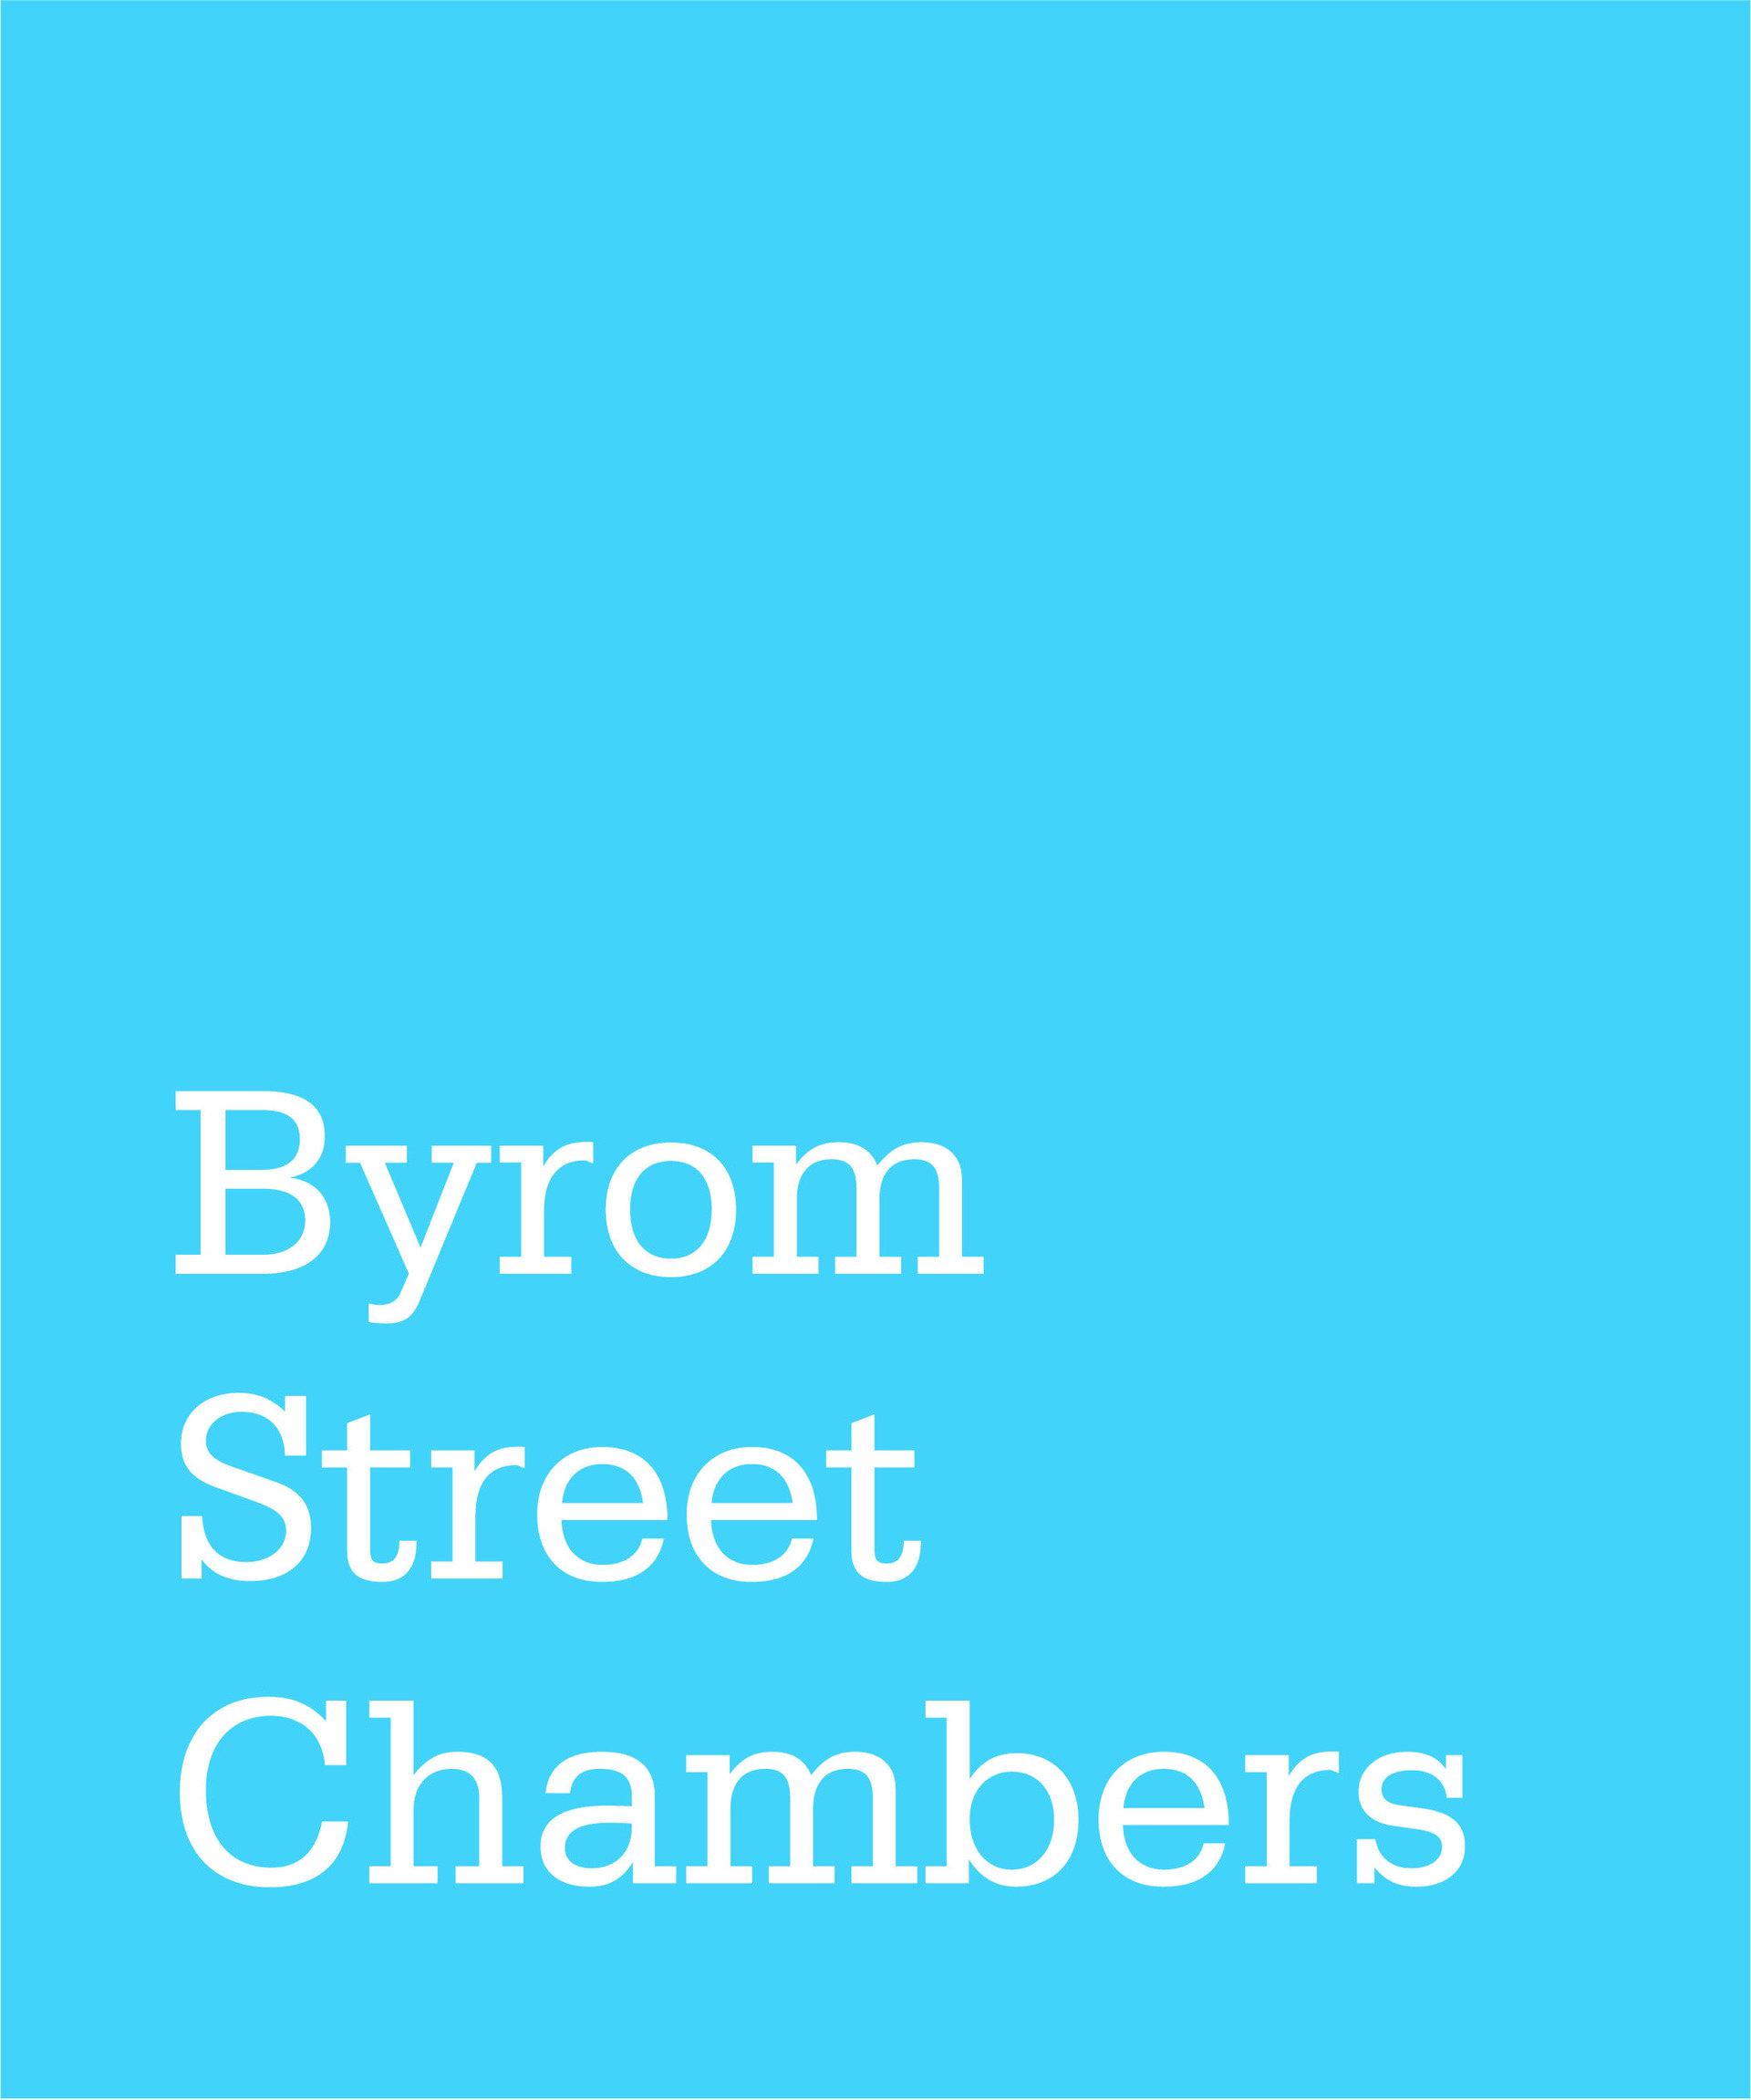 Byrom Street Chambers logo